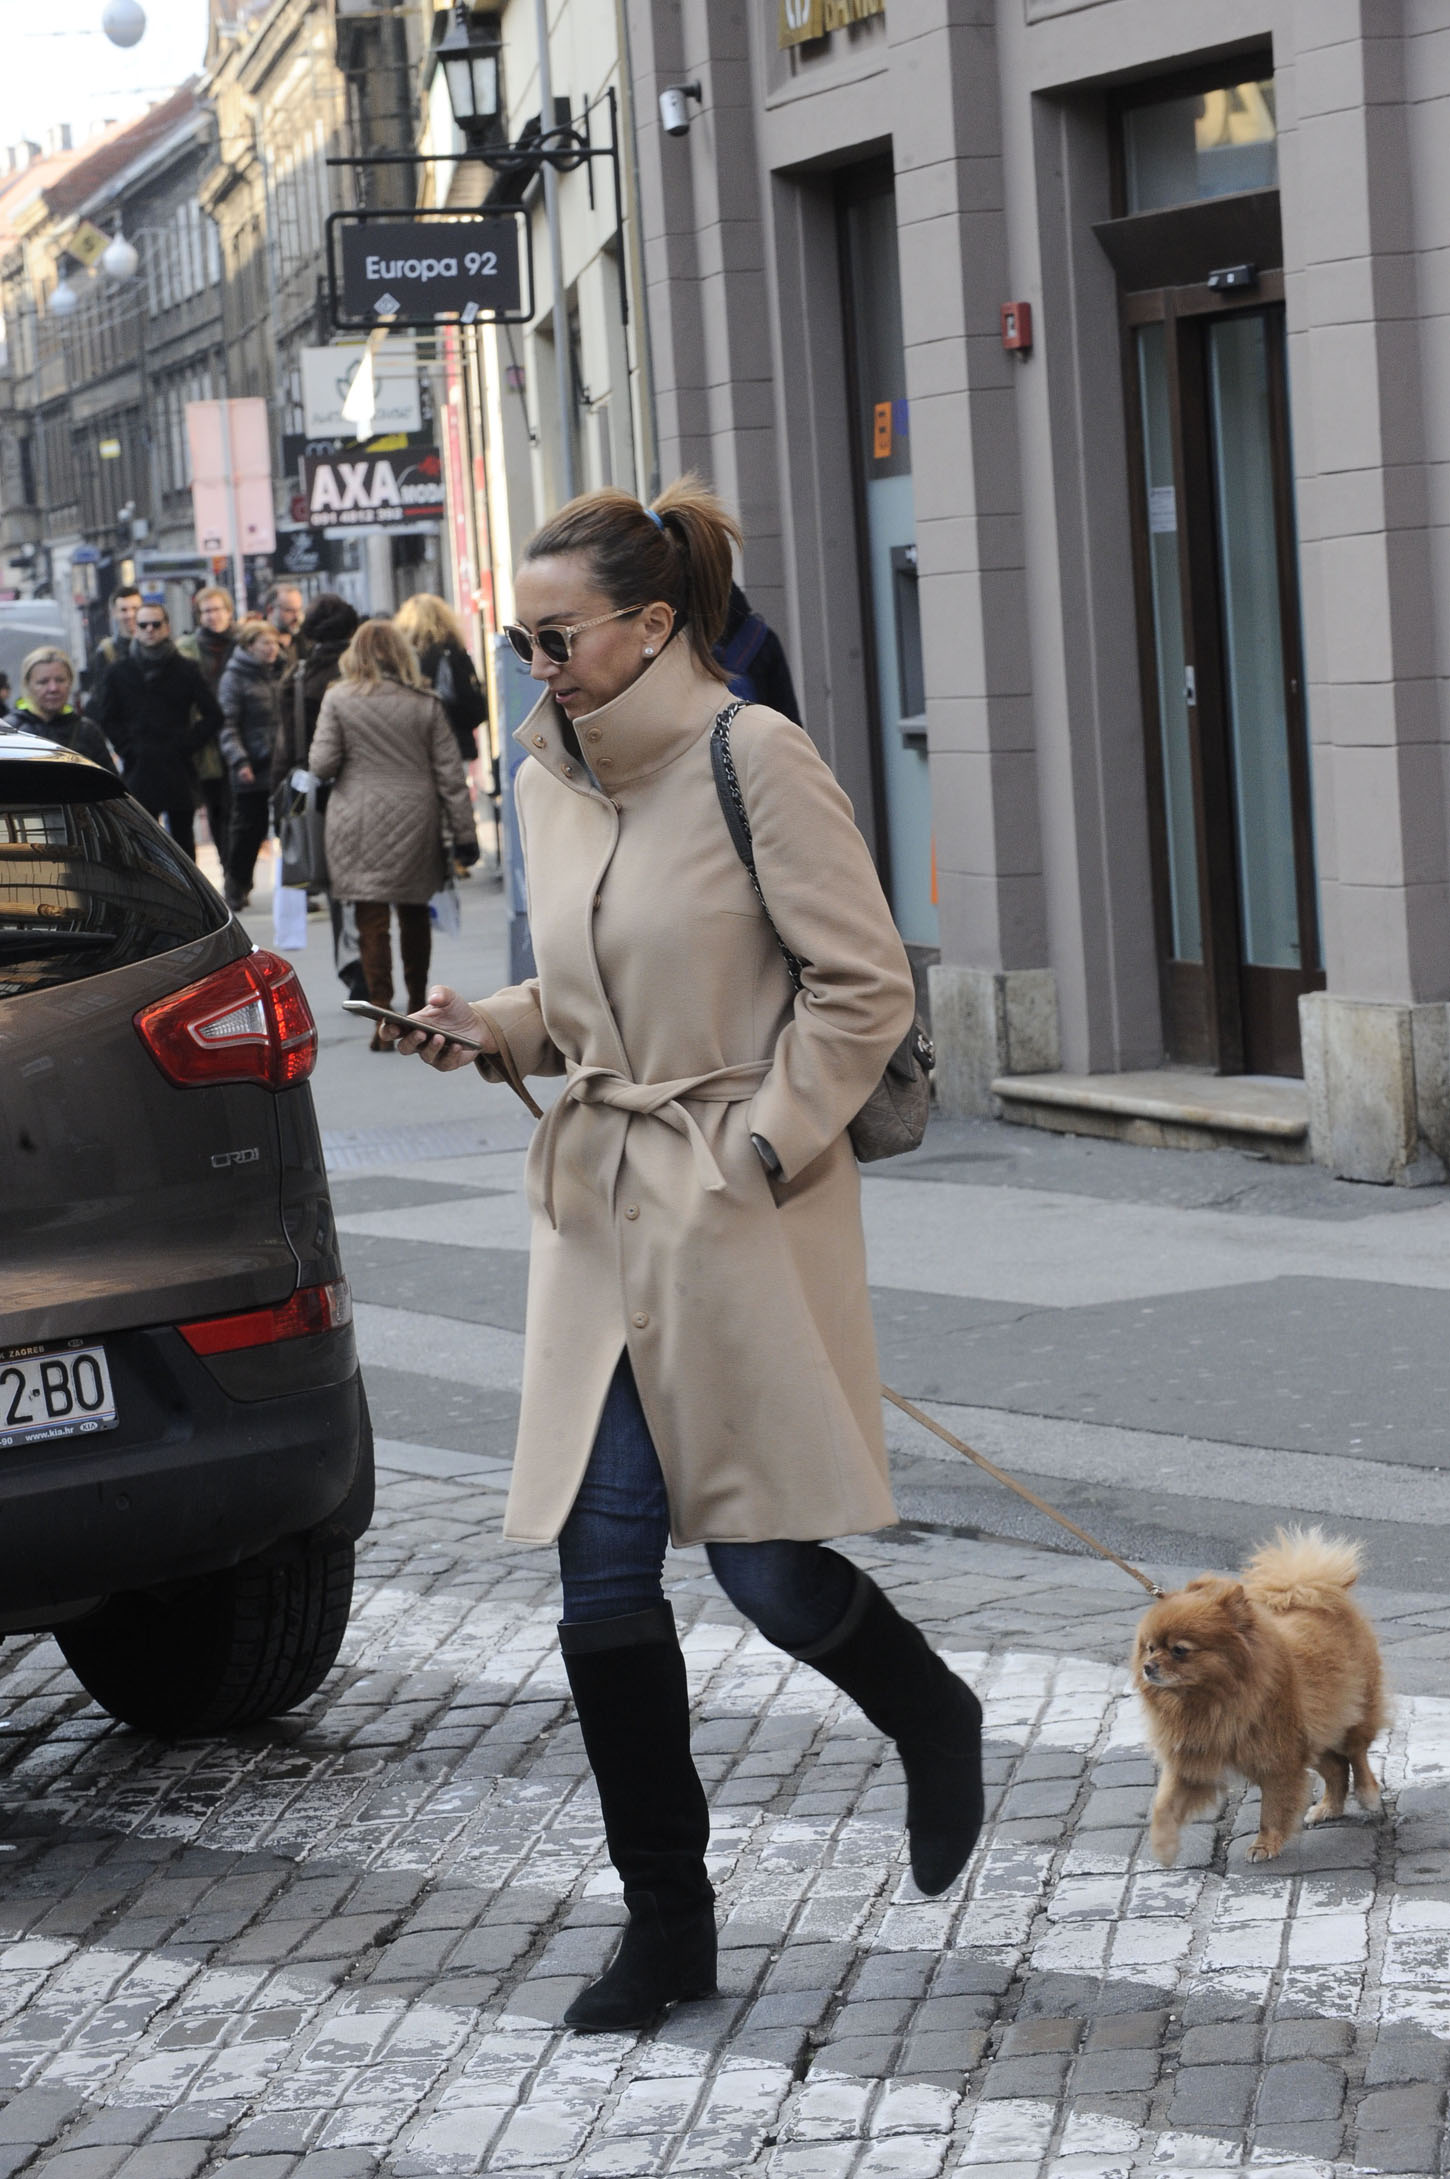 Spica / Zagreb 18.12.2017. / foto: Davor Matota / IIva Majoli i pas Lady